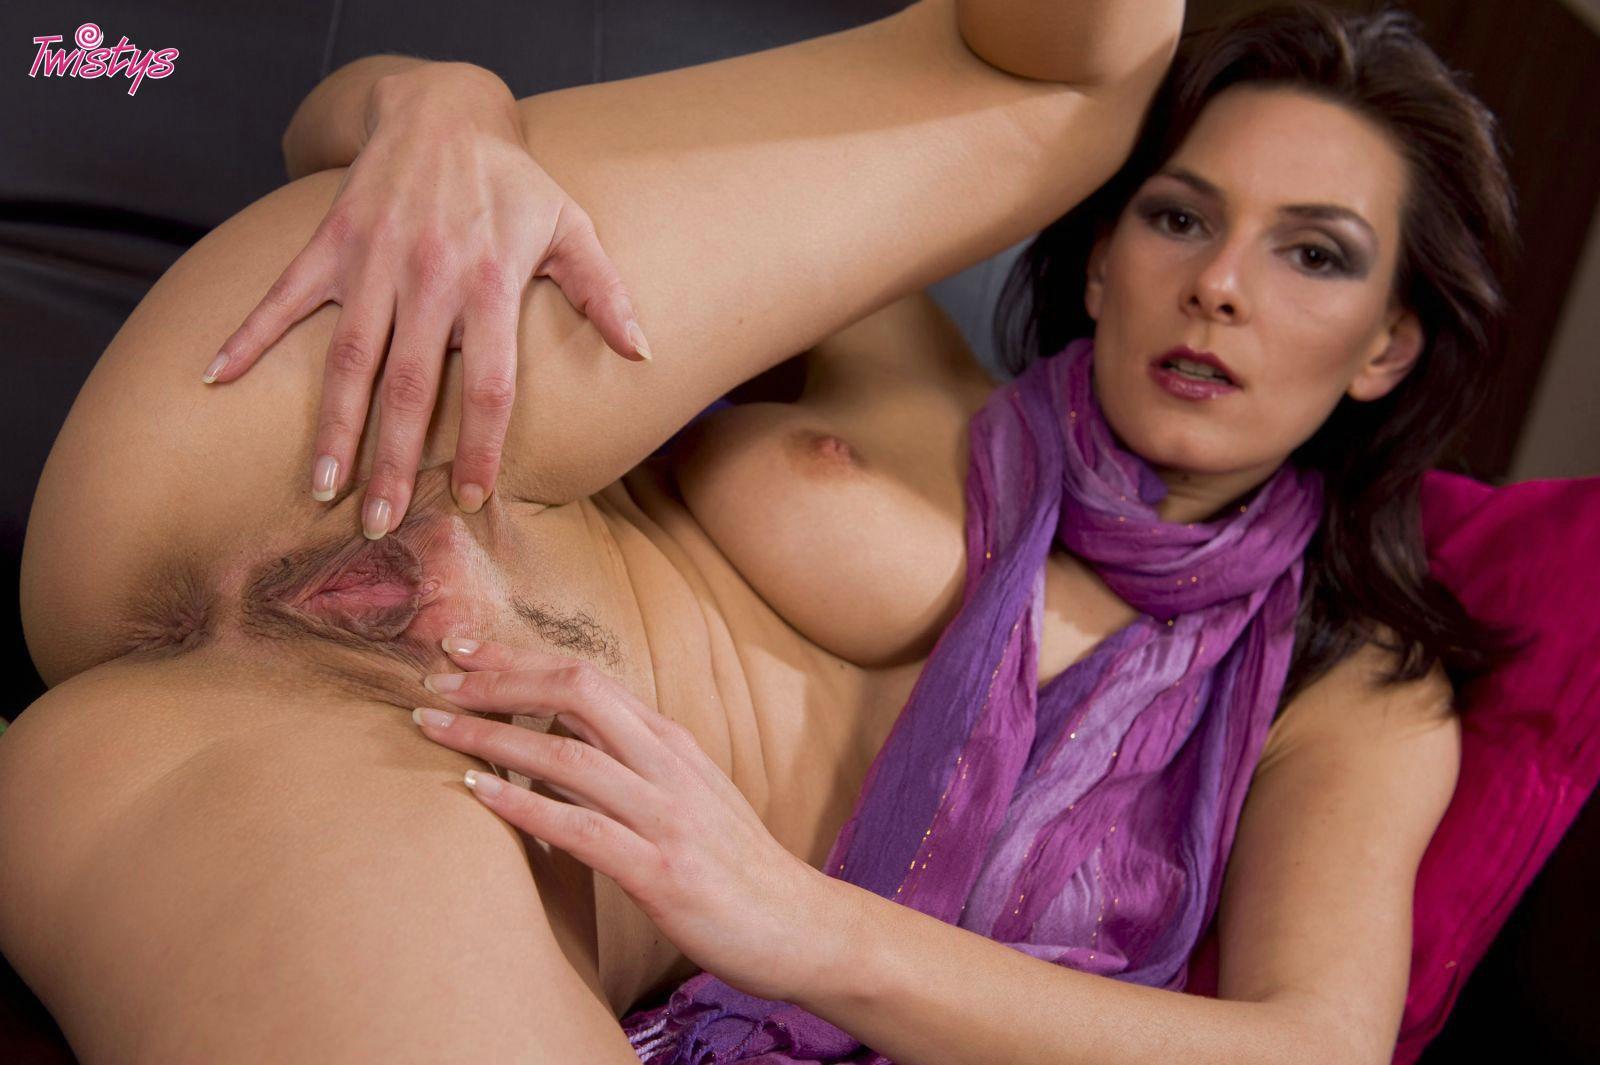 Alena chrastinova